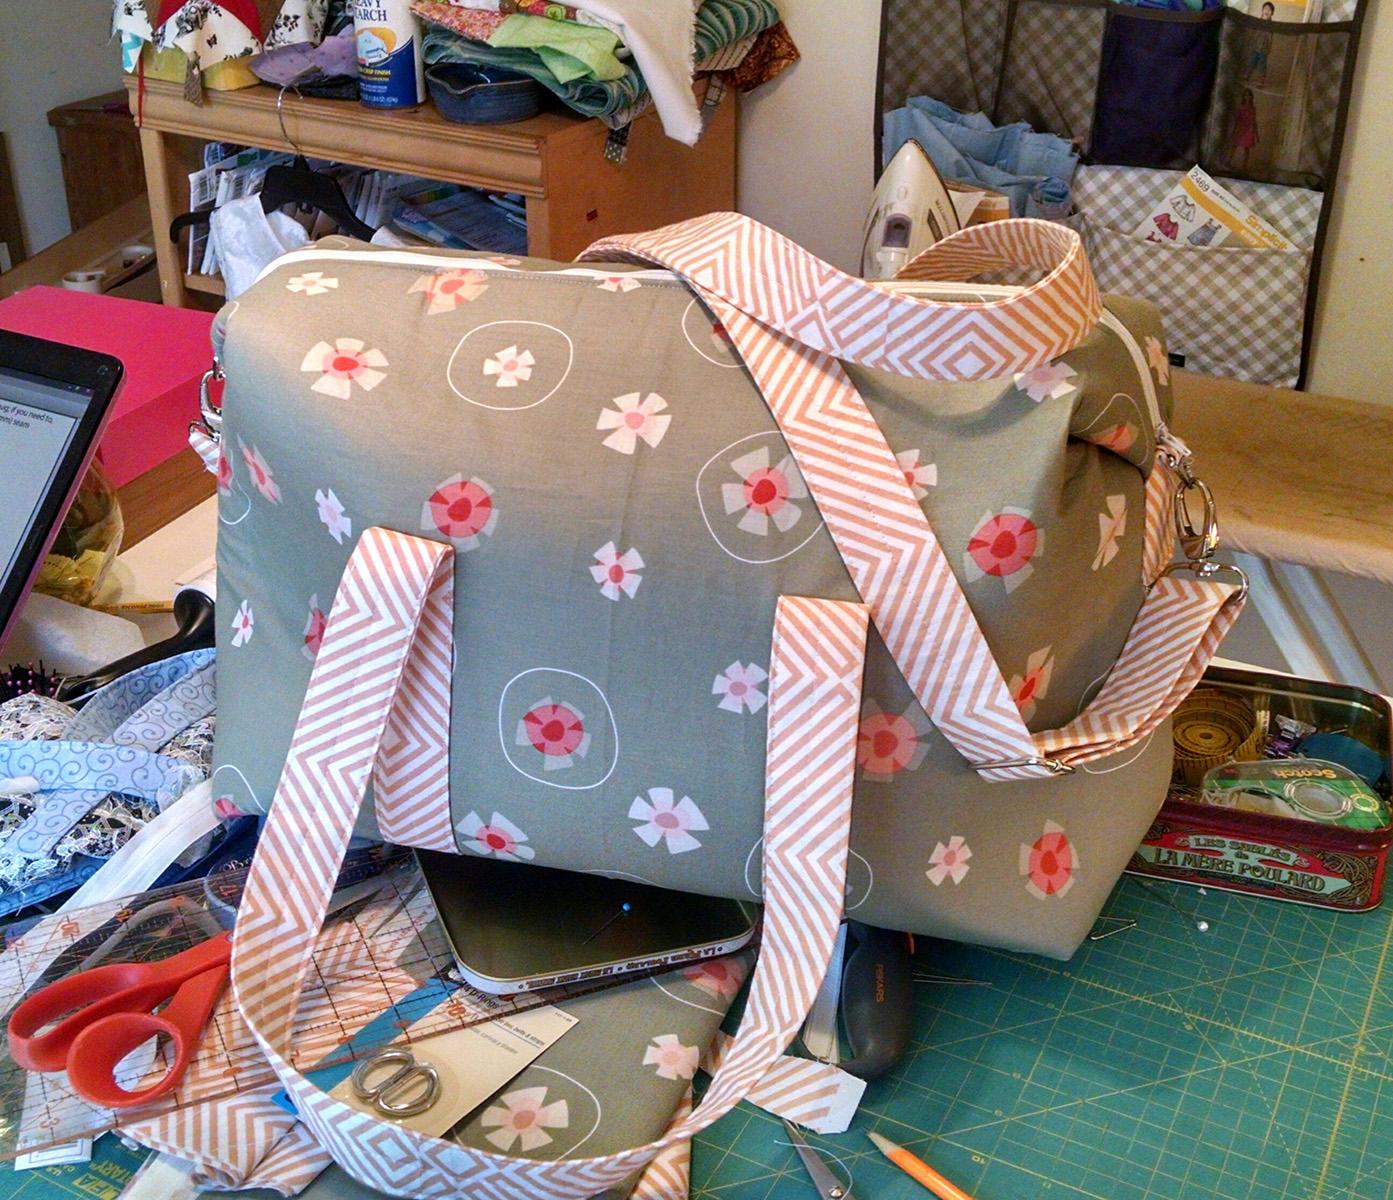 Sew Sweetness Emblem Duffle Bag, sewn by Jackie